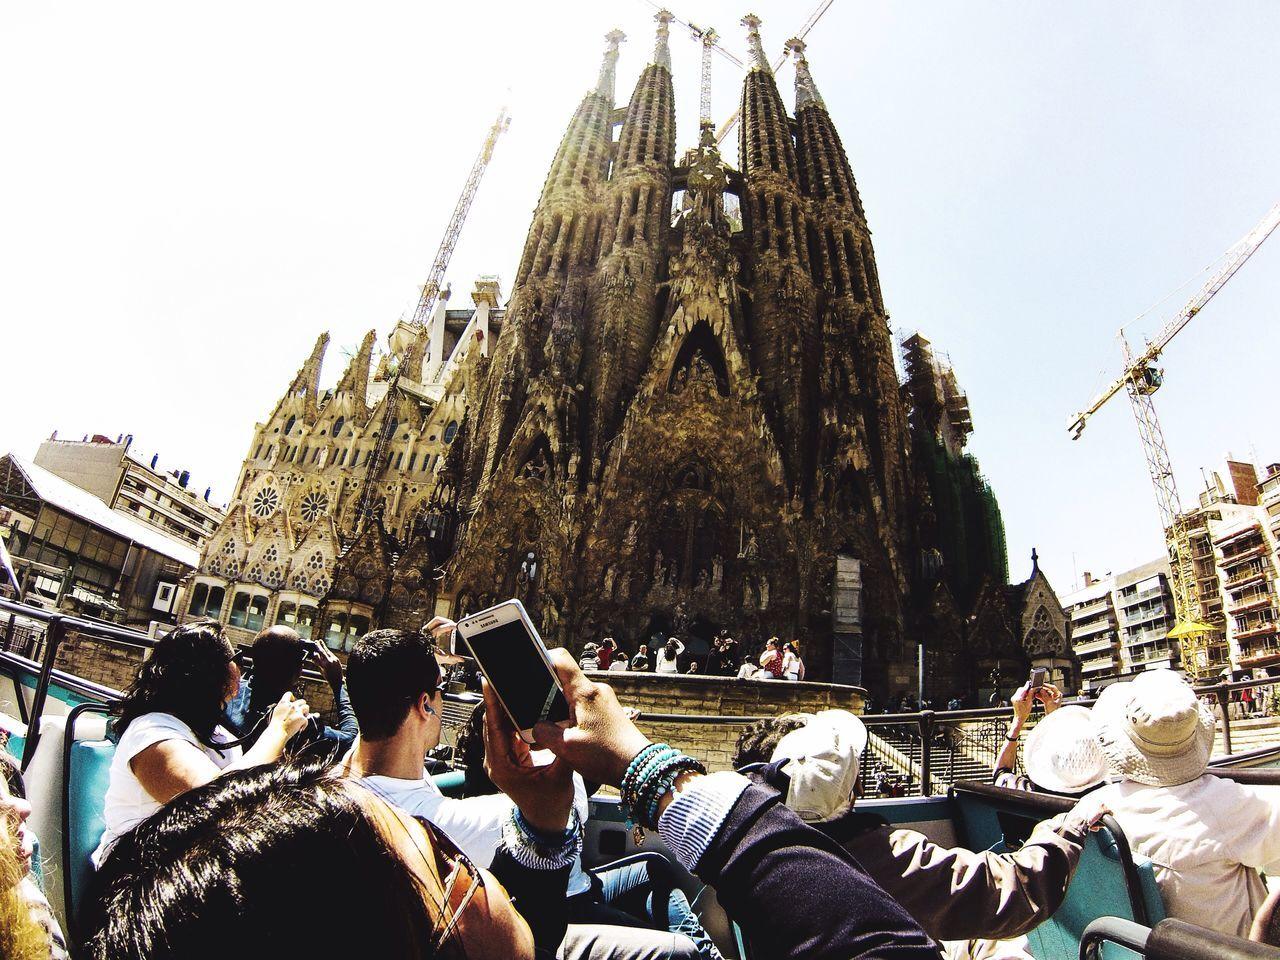 The Tourist Tourbus Tourism Citybus Barcelona♡♥♡♥♡ España Barcelona Barça Sagrada Familia Sagradafamilia Gopro